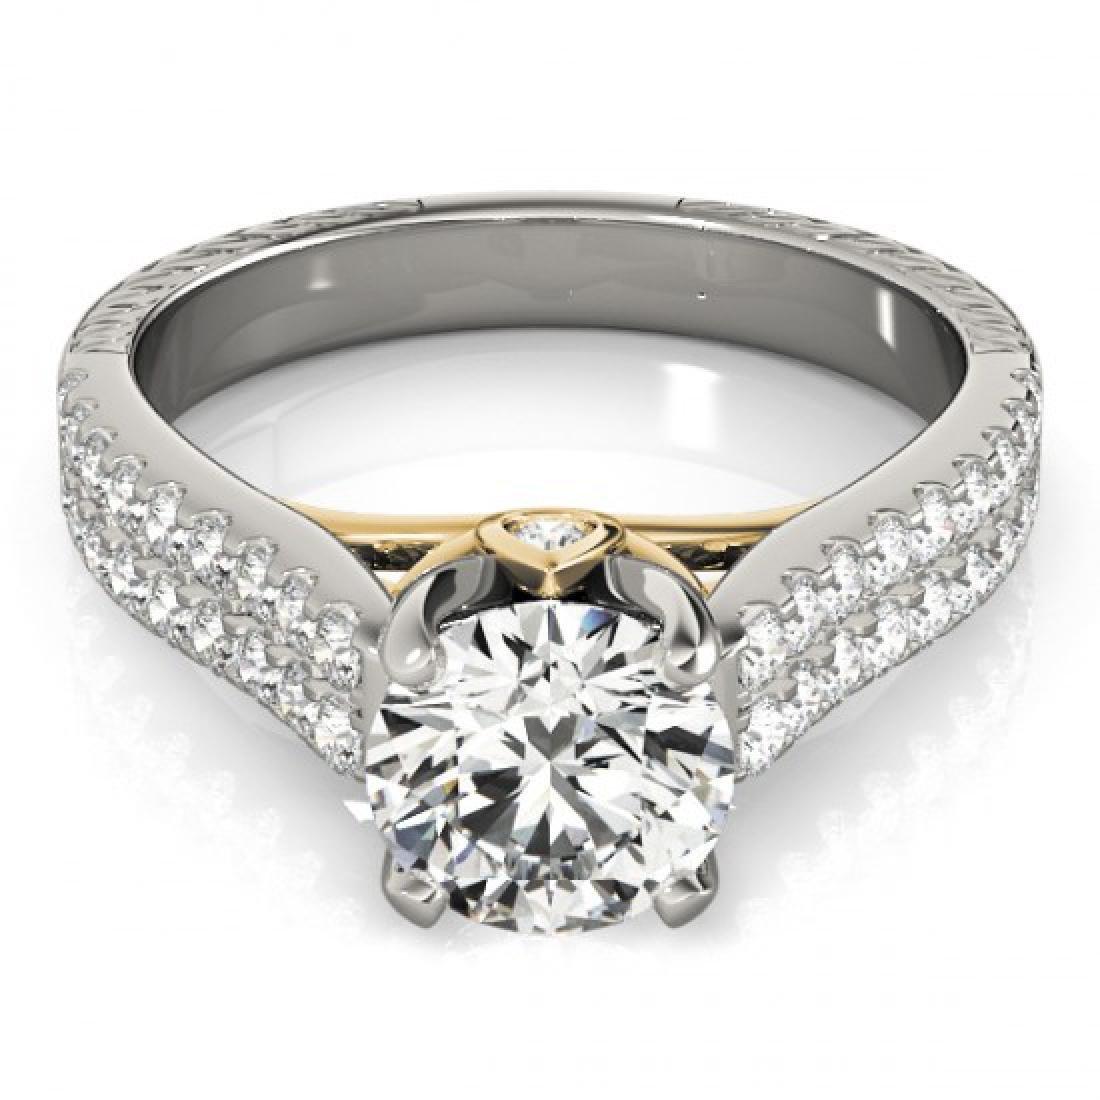 2.11 CTW Certified VS/SI Diamond Pave Ring 14K White &